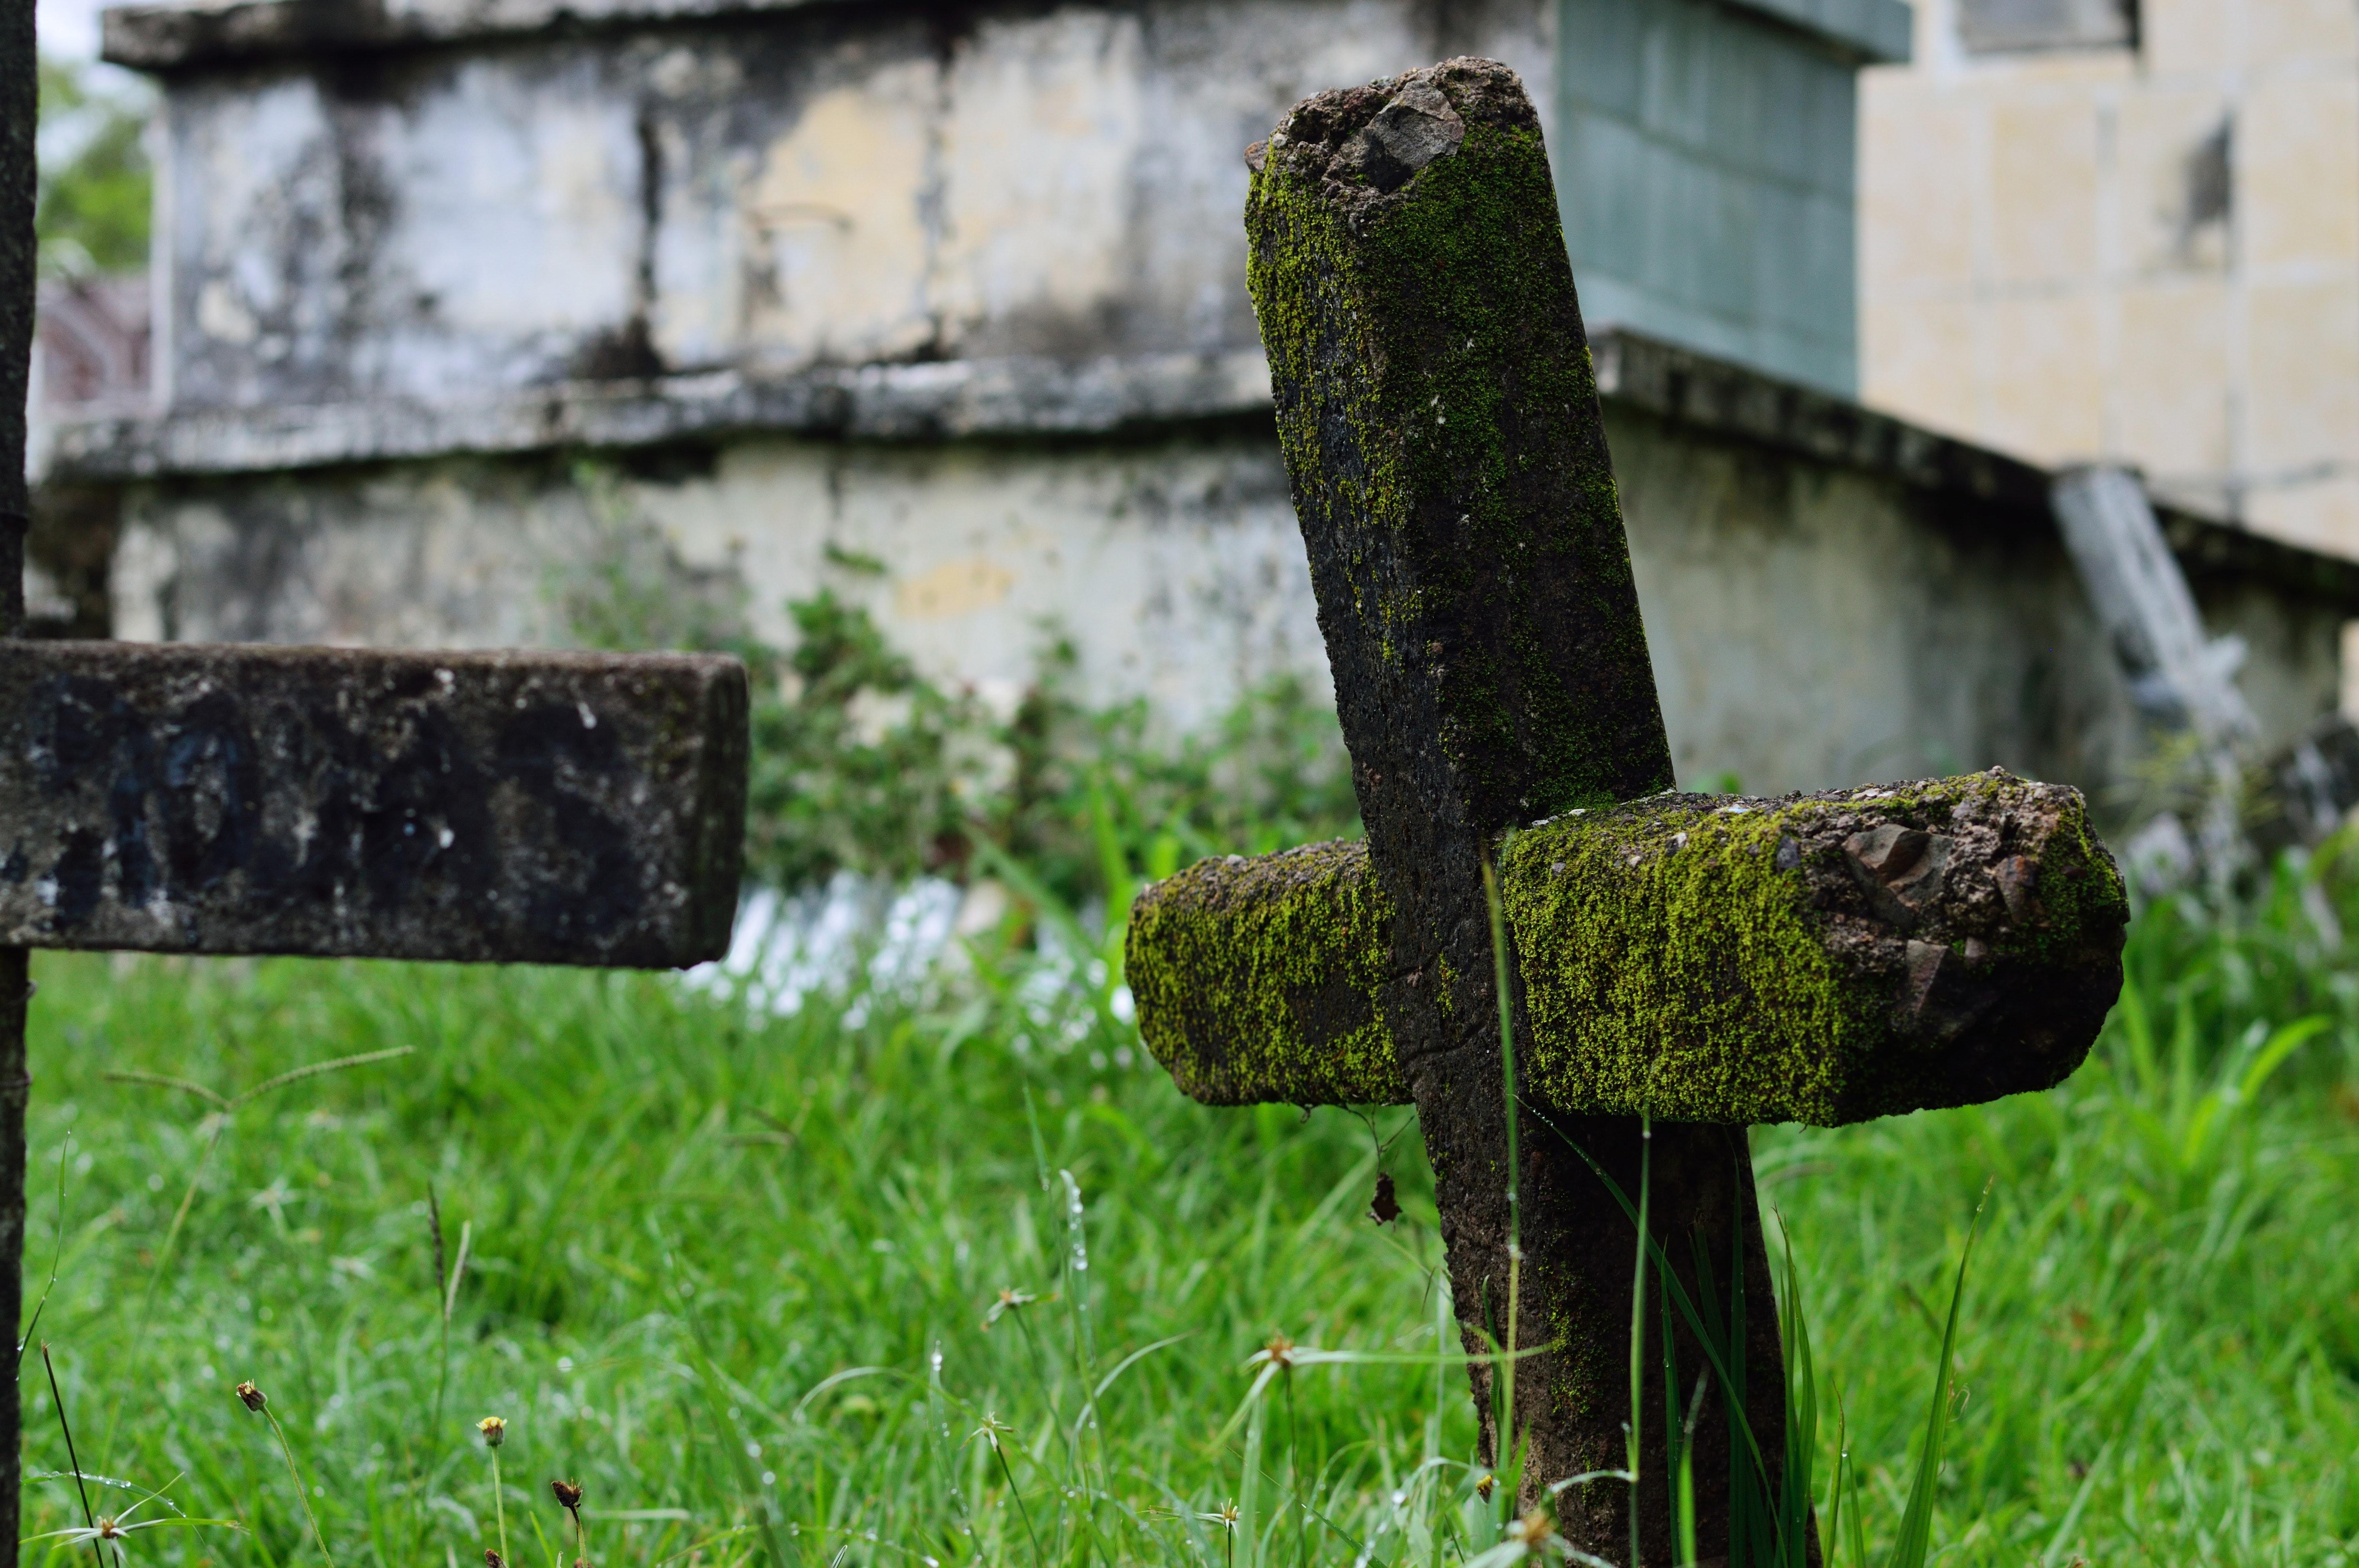 ancient-burial-cemetery-creepy-446461